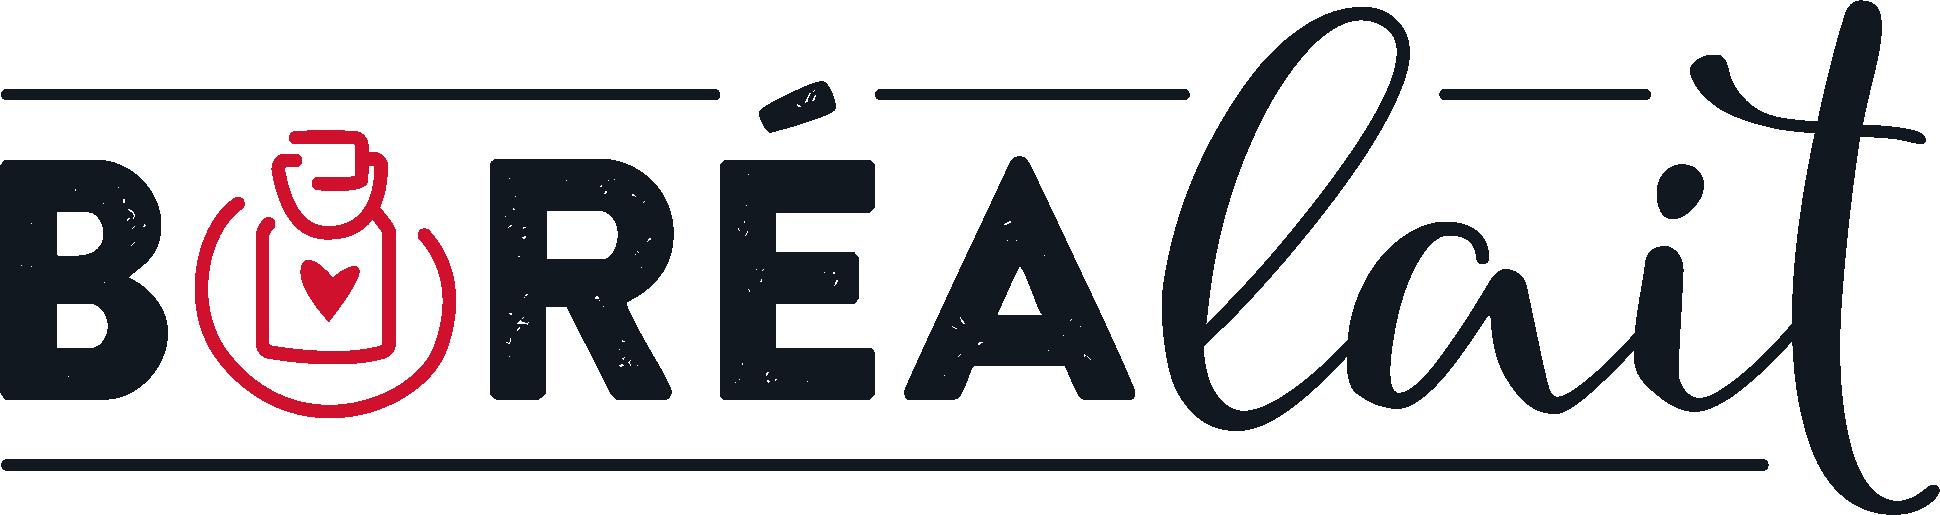 Borealait Logo Pantone